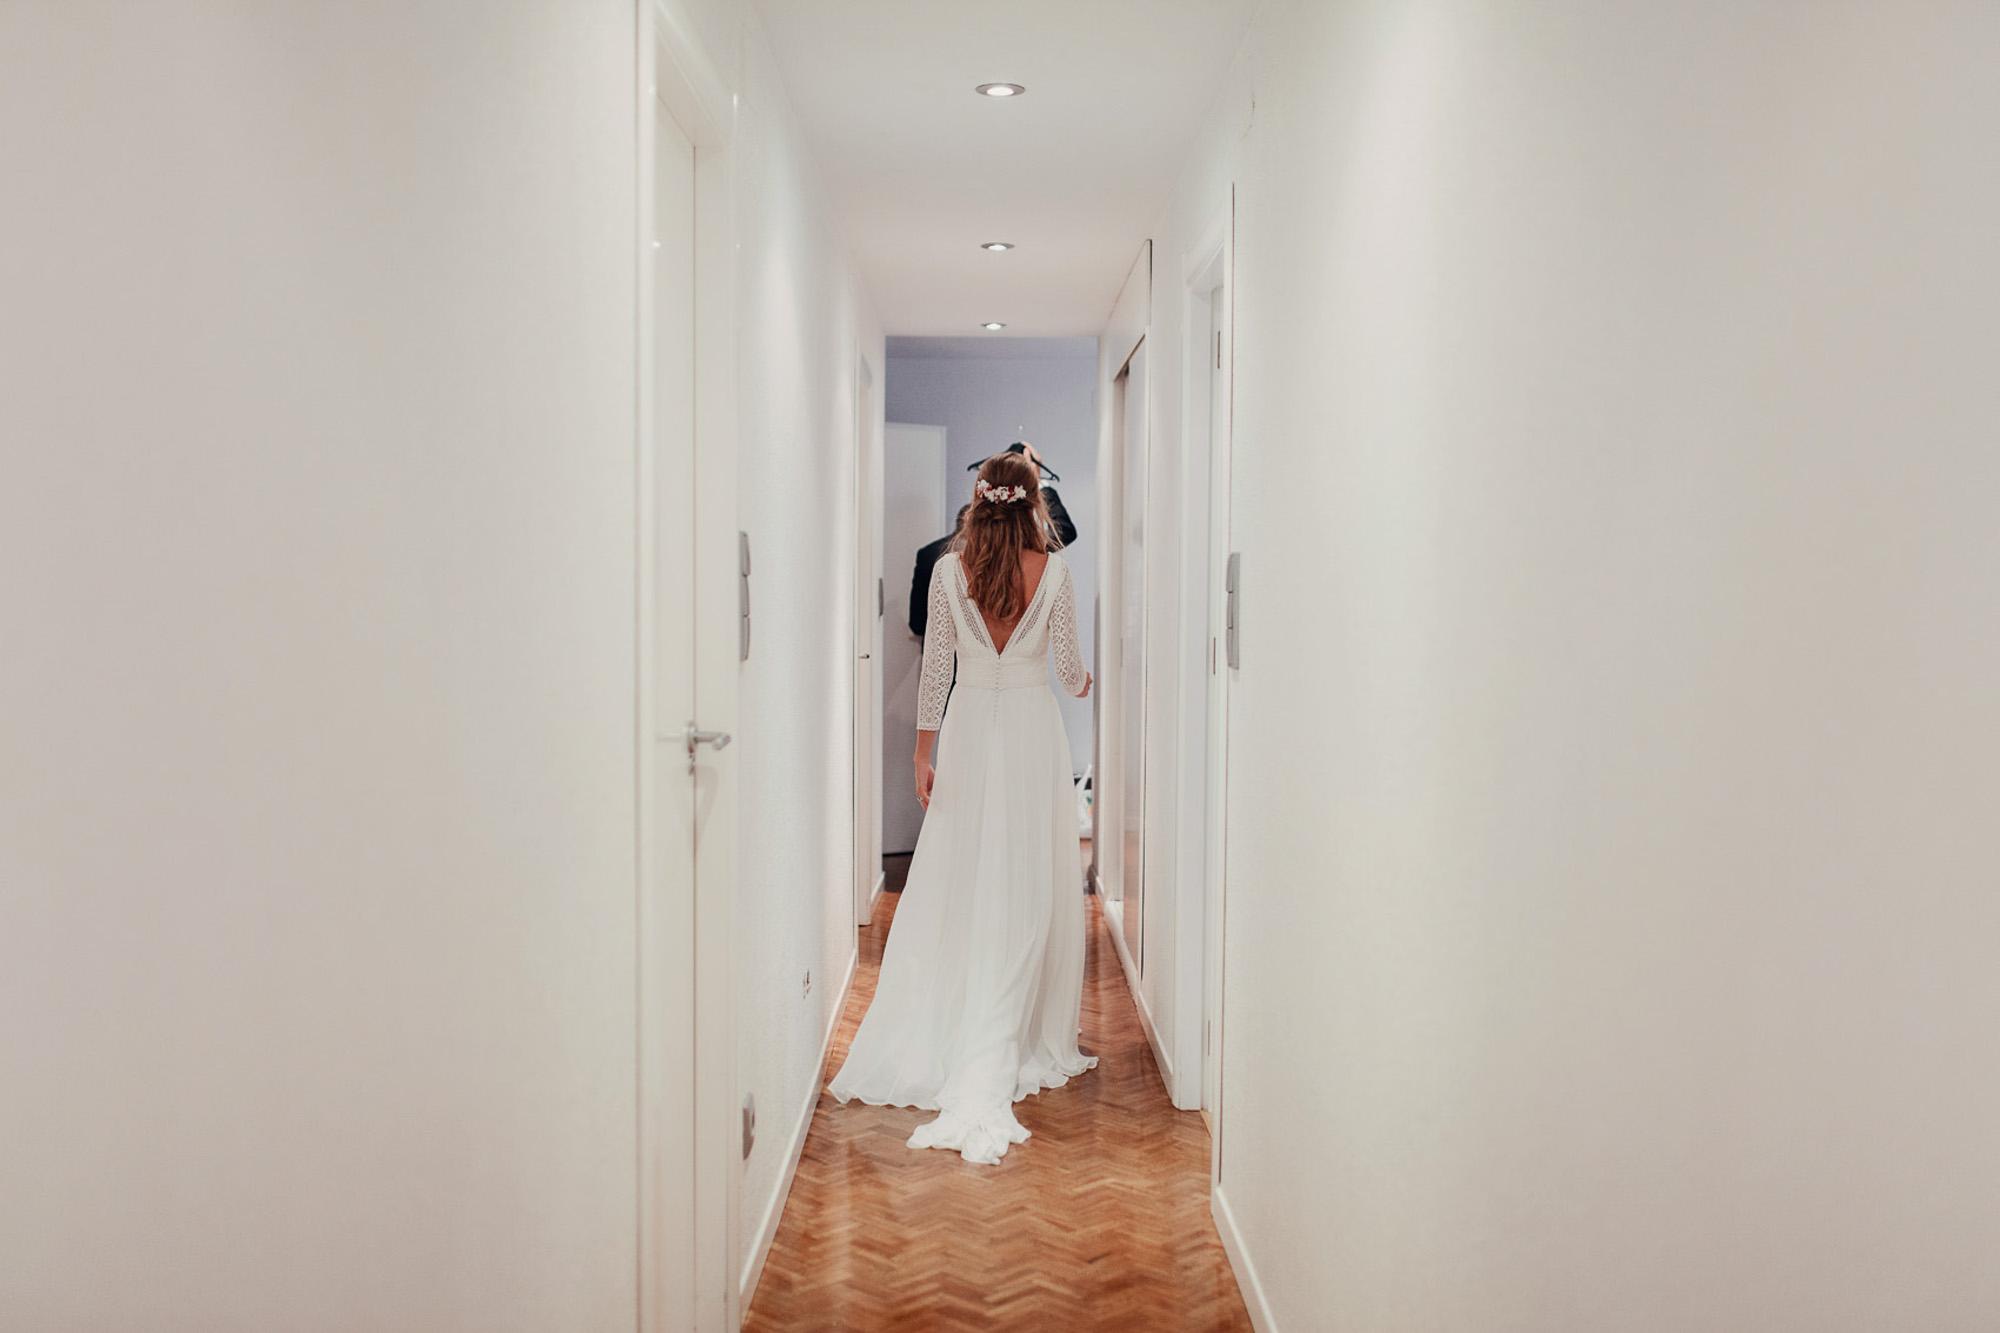 pasillo casa novia vestido tocado blanco wedding